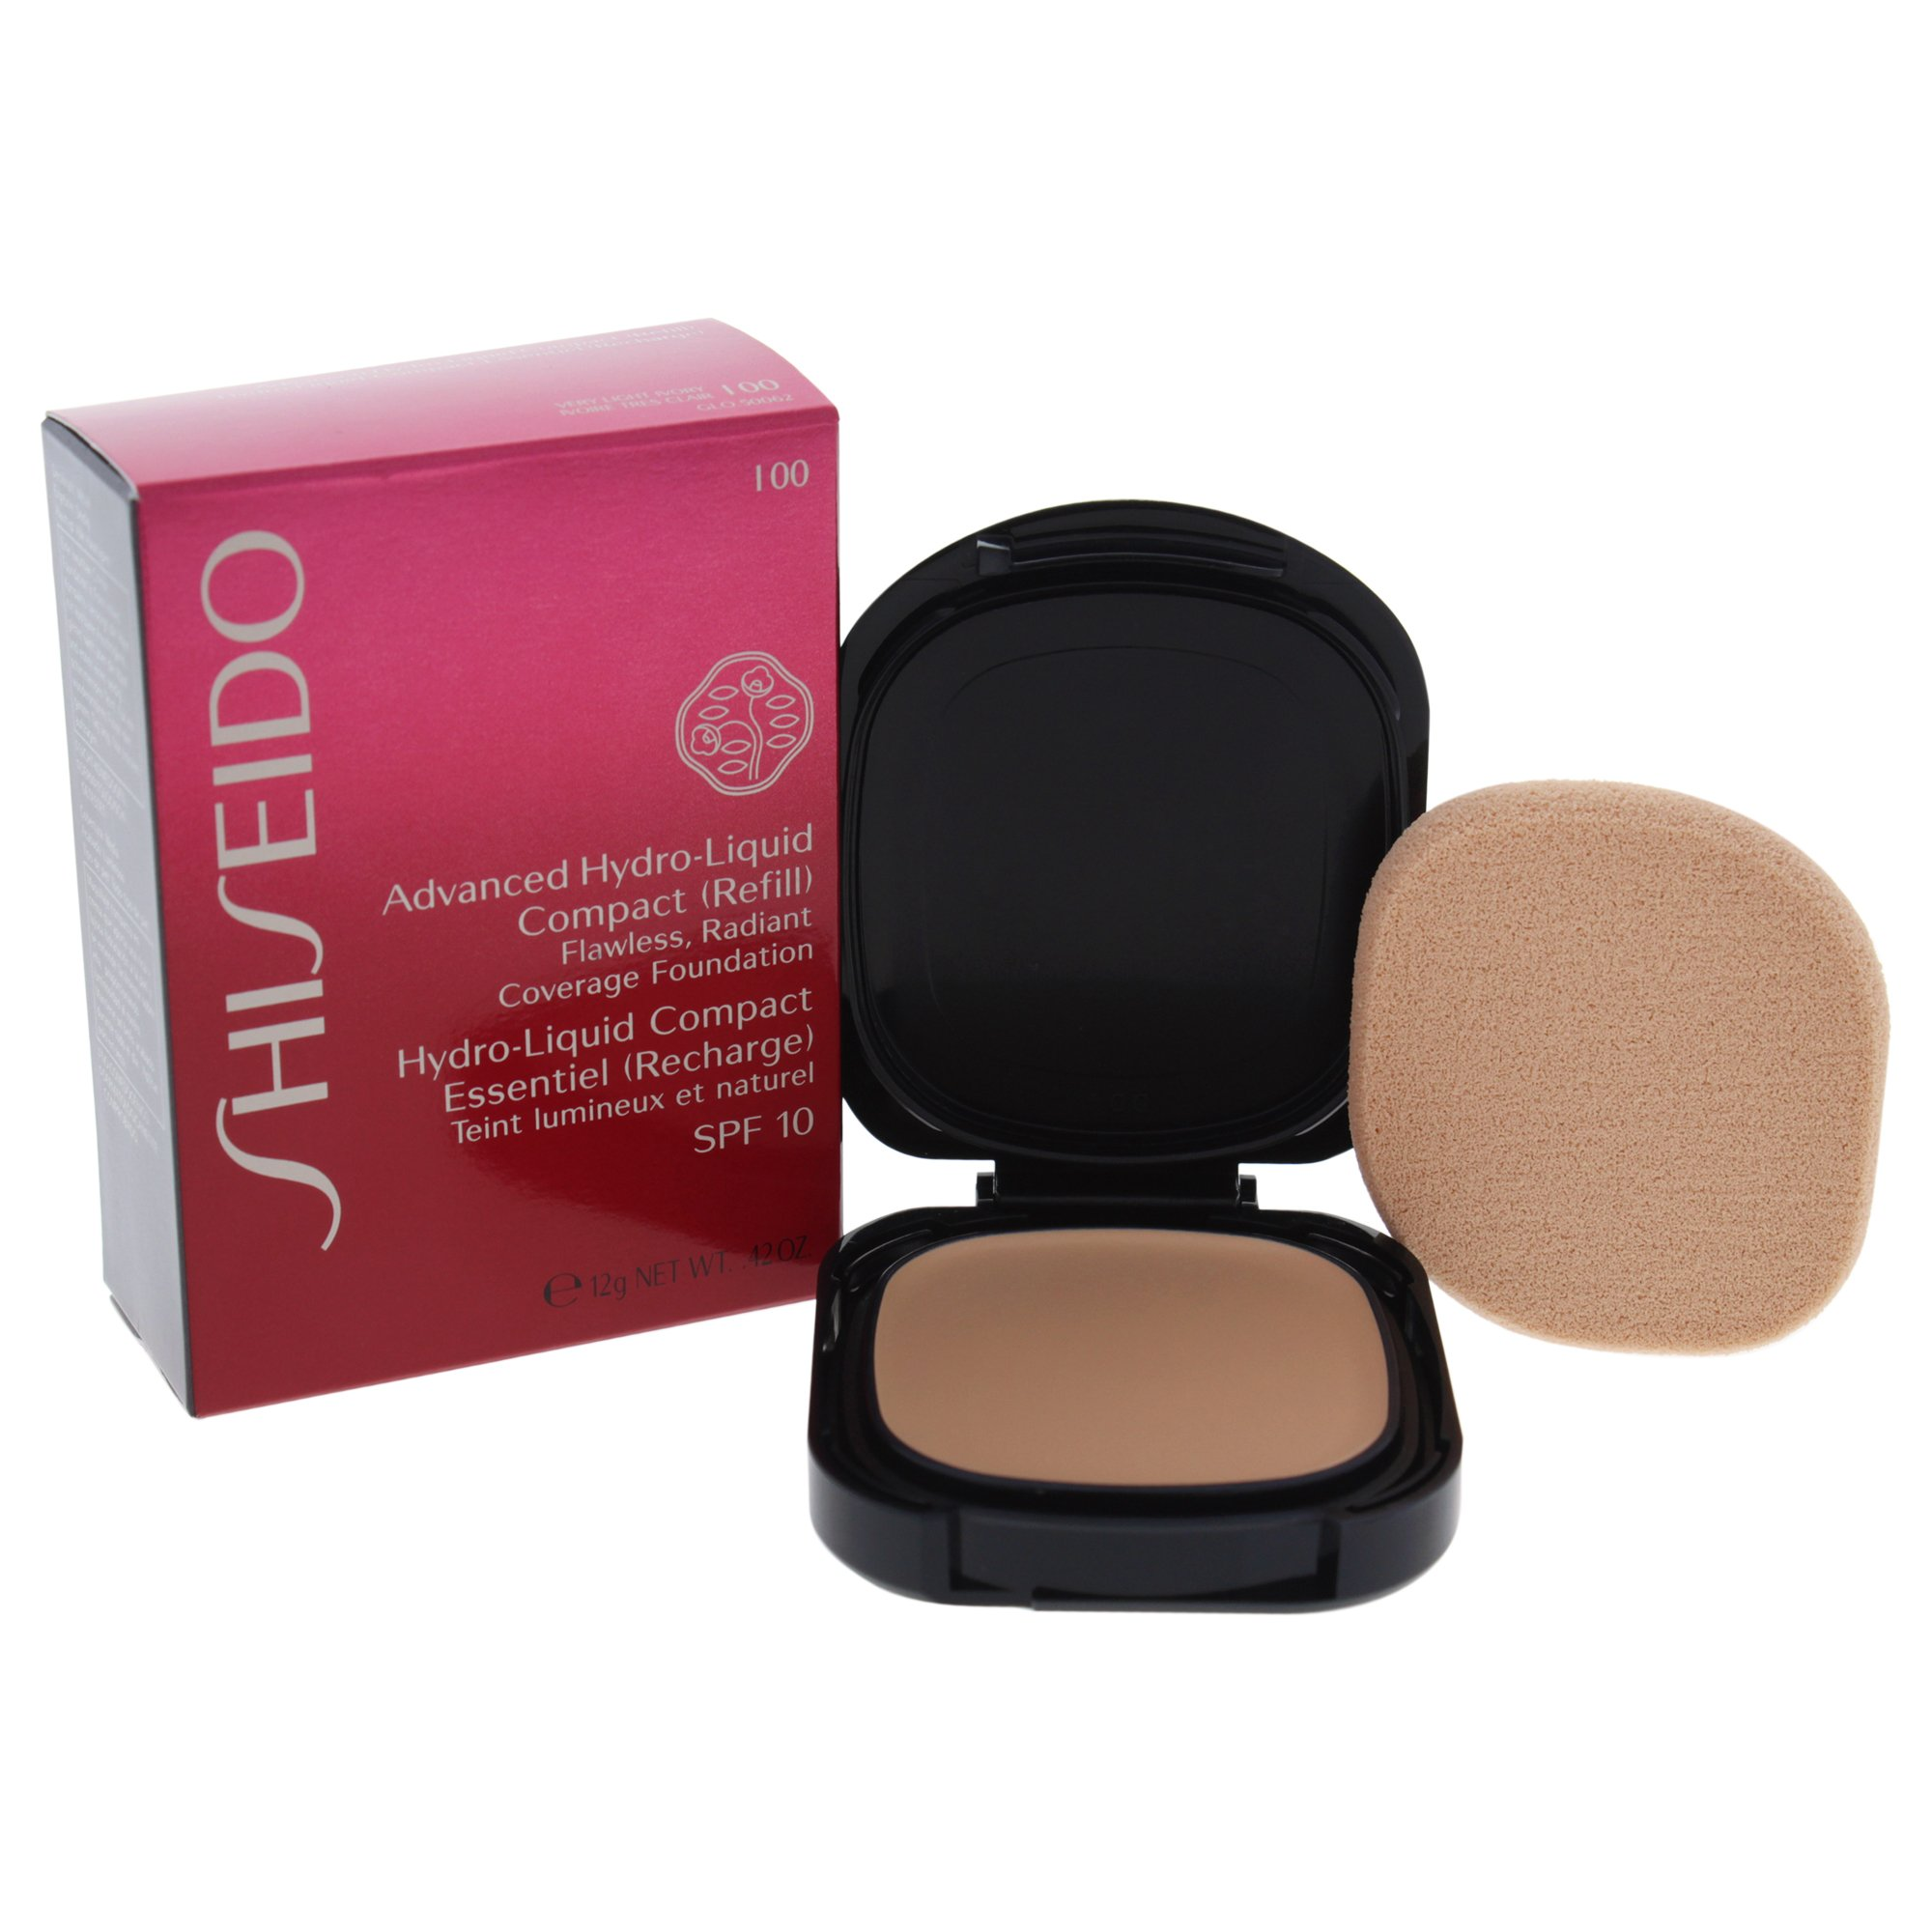 Shiseido Advanced Hydro-liquid SPF 10 Compact Foudation, Very Light Ivory (refill), 0.42 Ounce